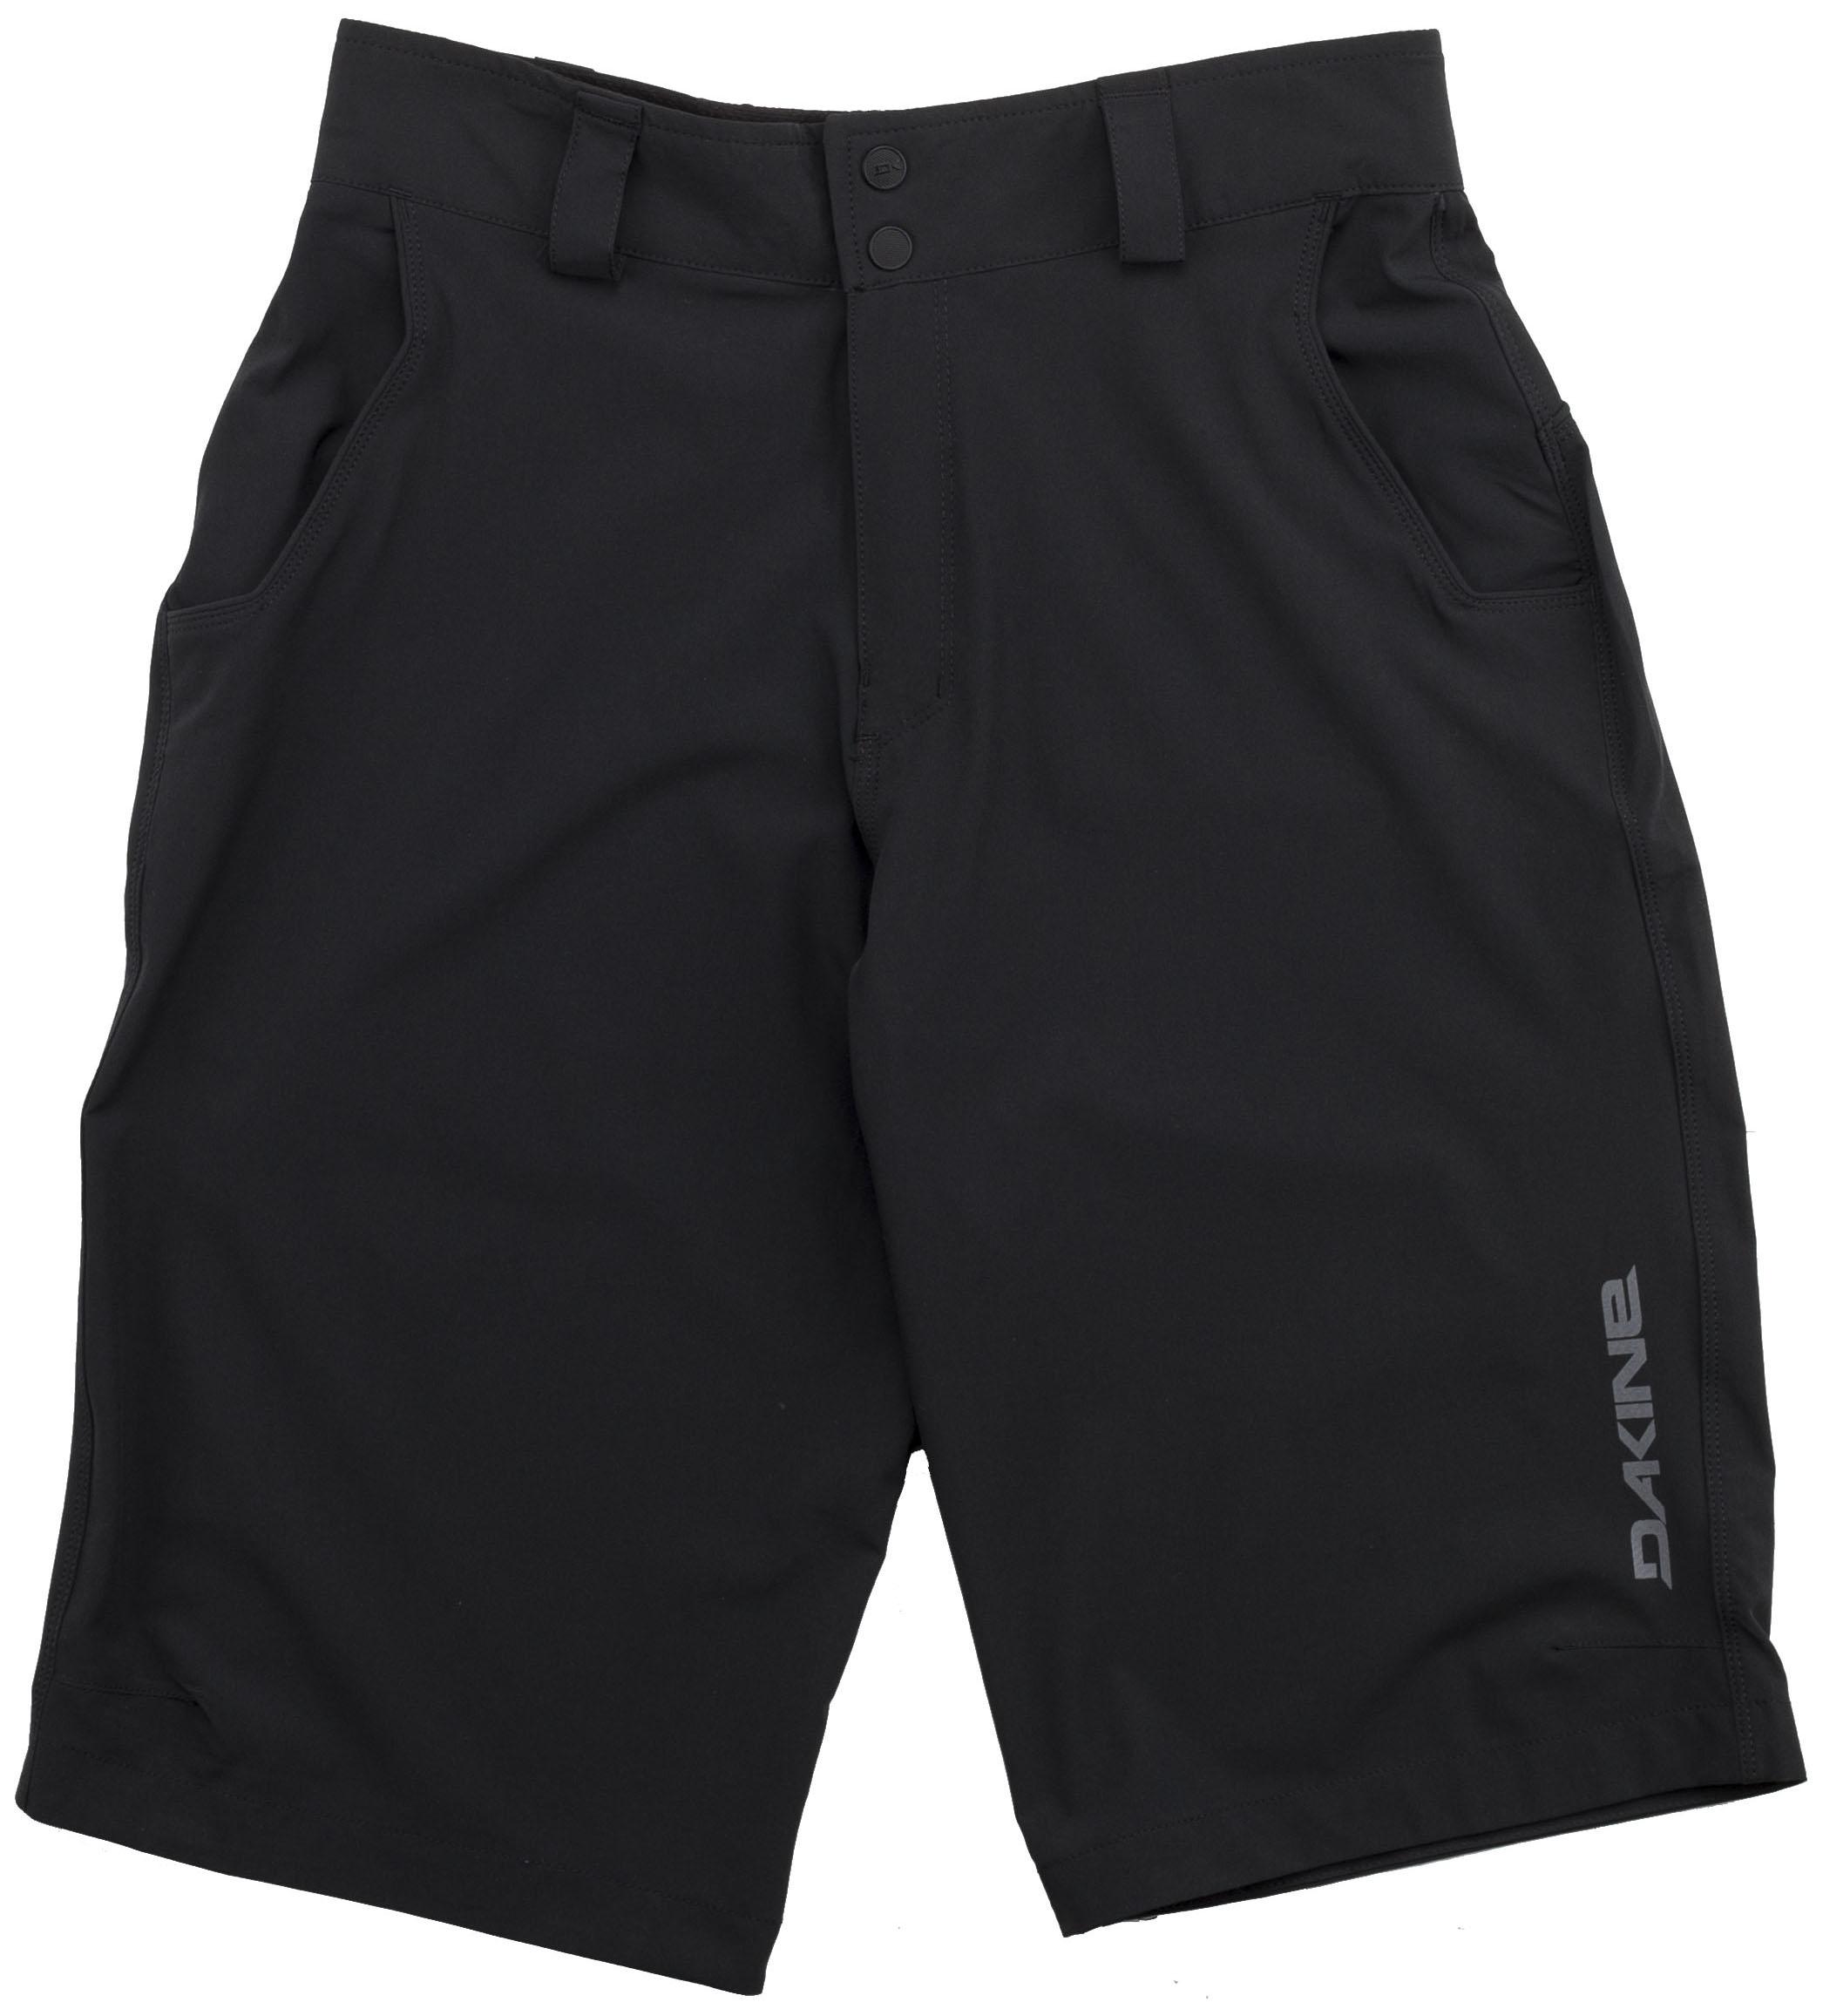 Dakine Pace Shorts 2016